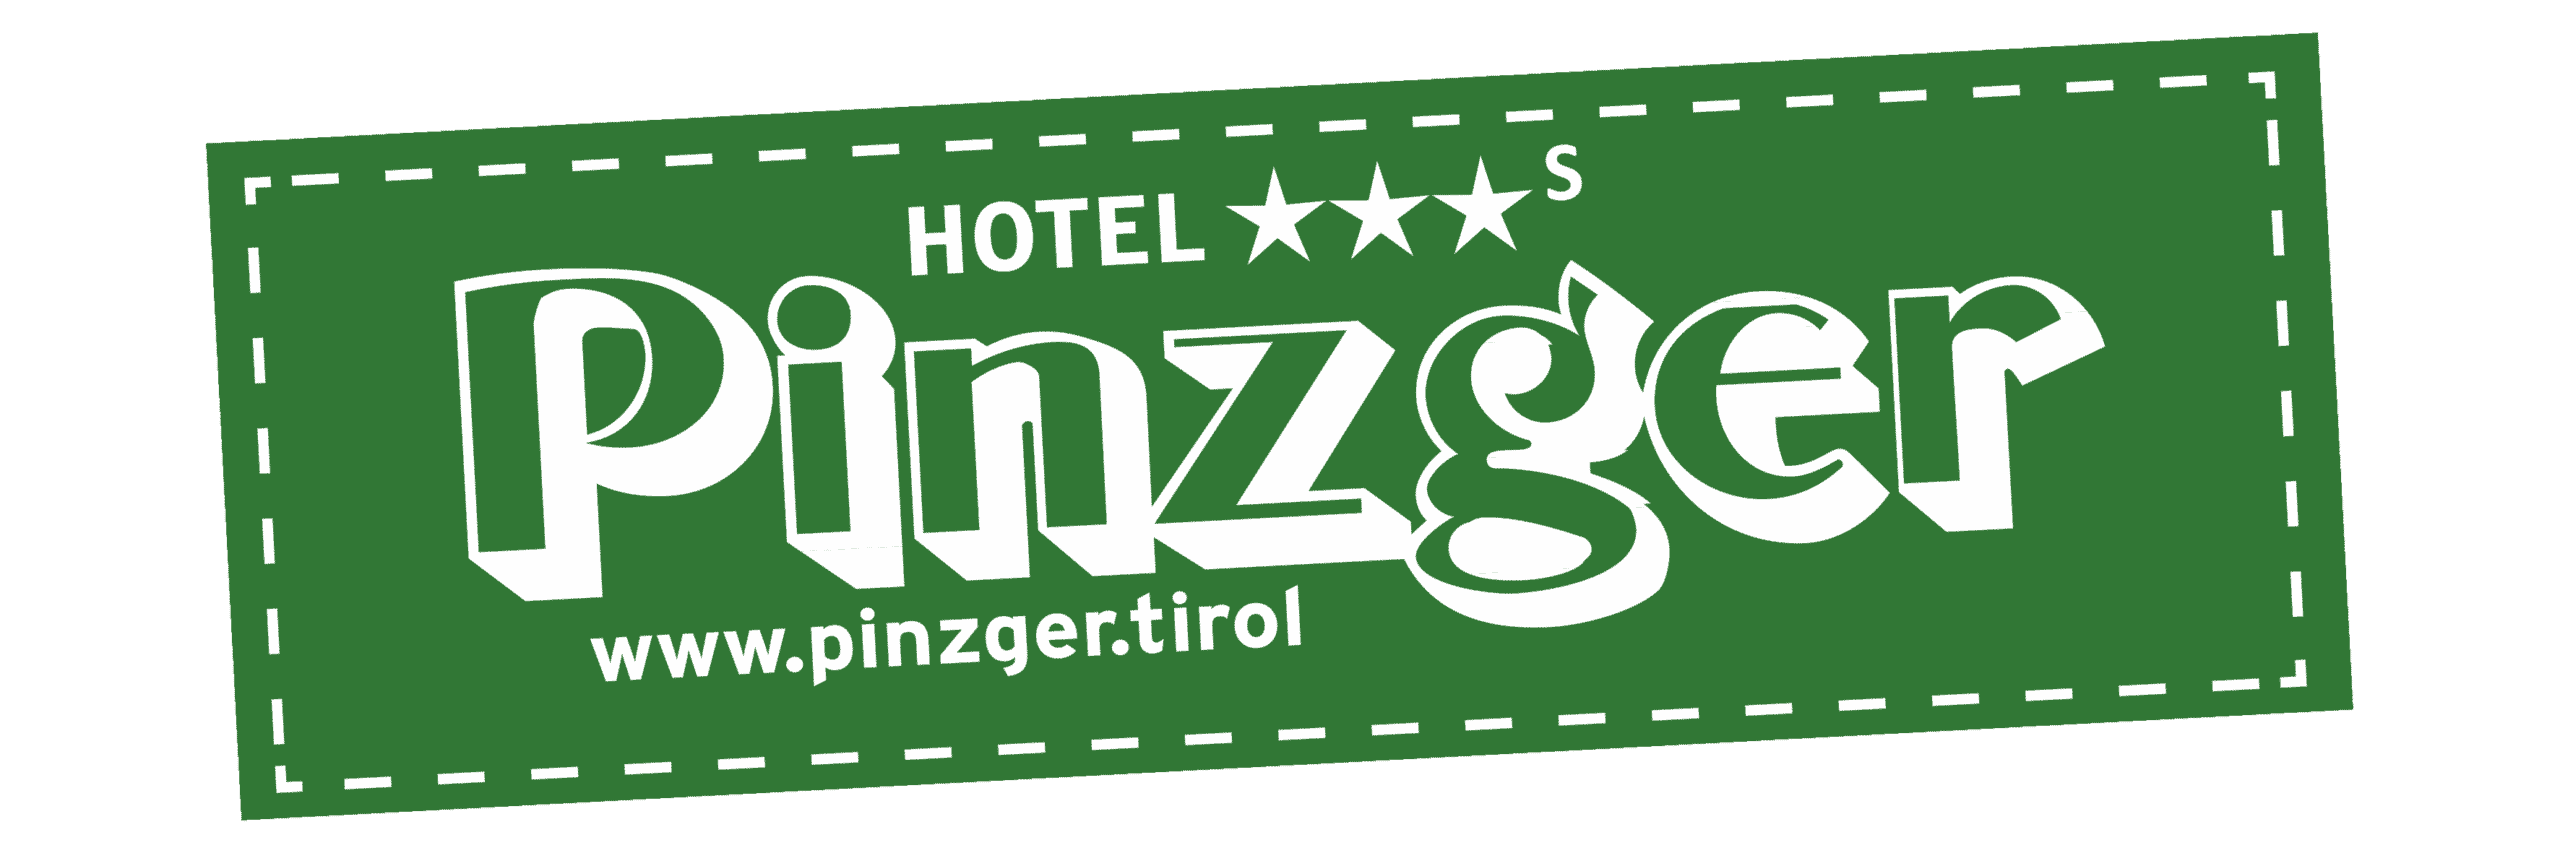 Hotel Pinzger Tux